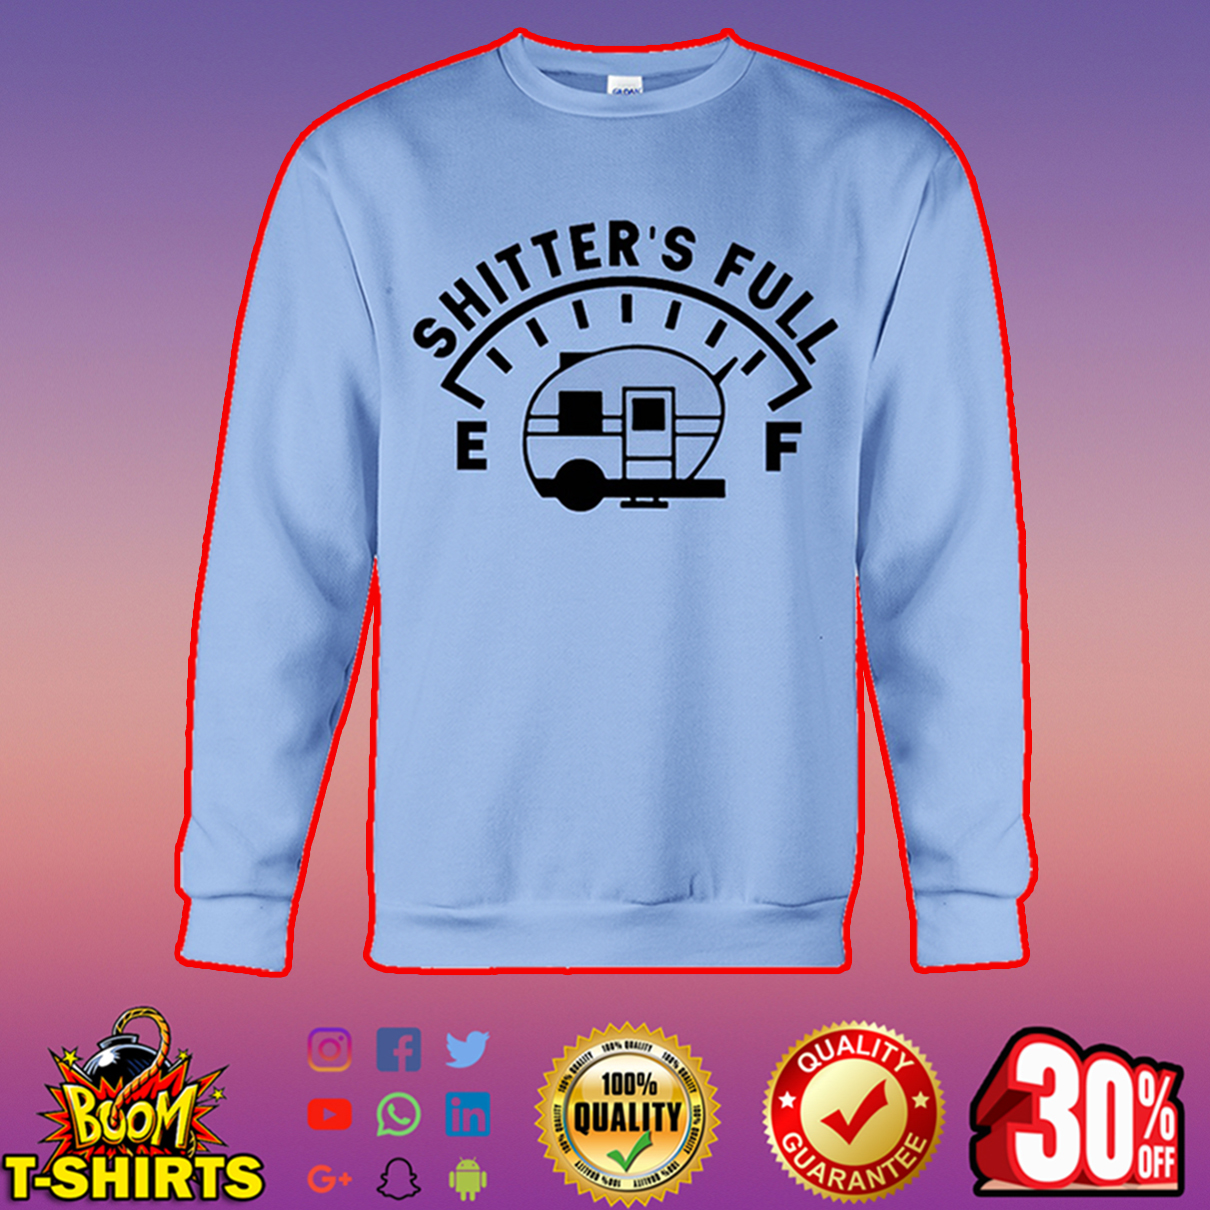 Shitter's full camping sweatshirt